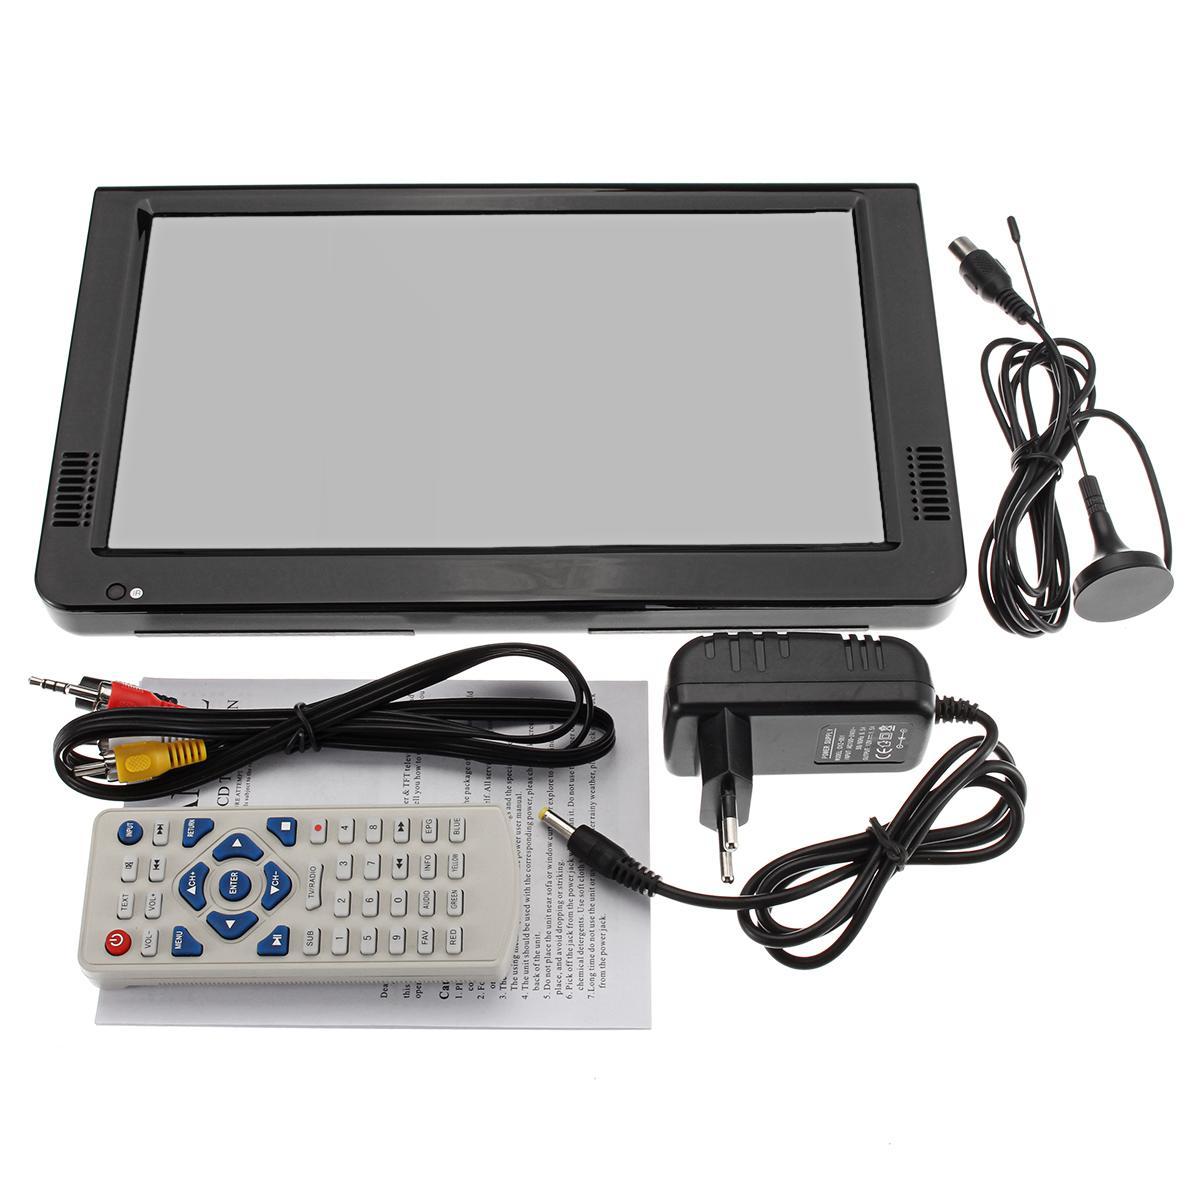 Outdoor 10,2 Inch 12V Tragbare Digital Analog Fernsehen DVB T/DVB T2 TFT LED HD TV Unterstützung TF Karte USB audio Auto Fernsehen - 6